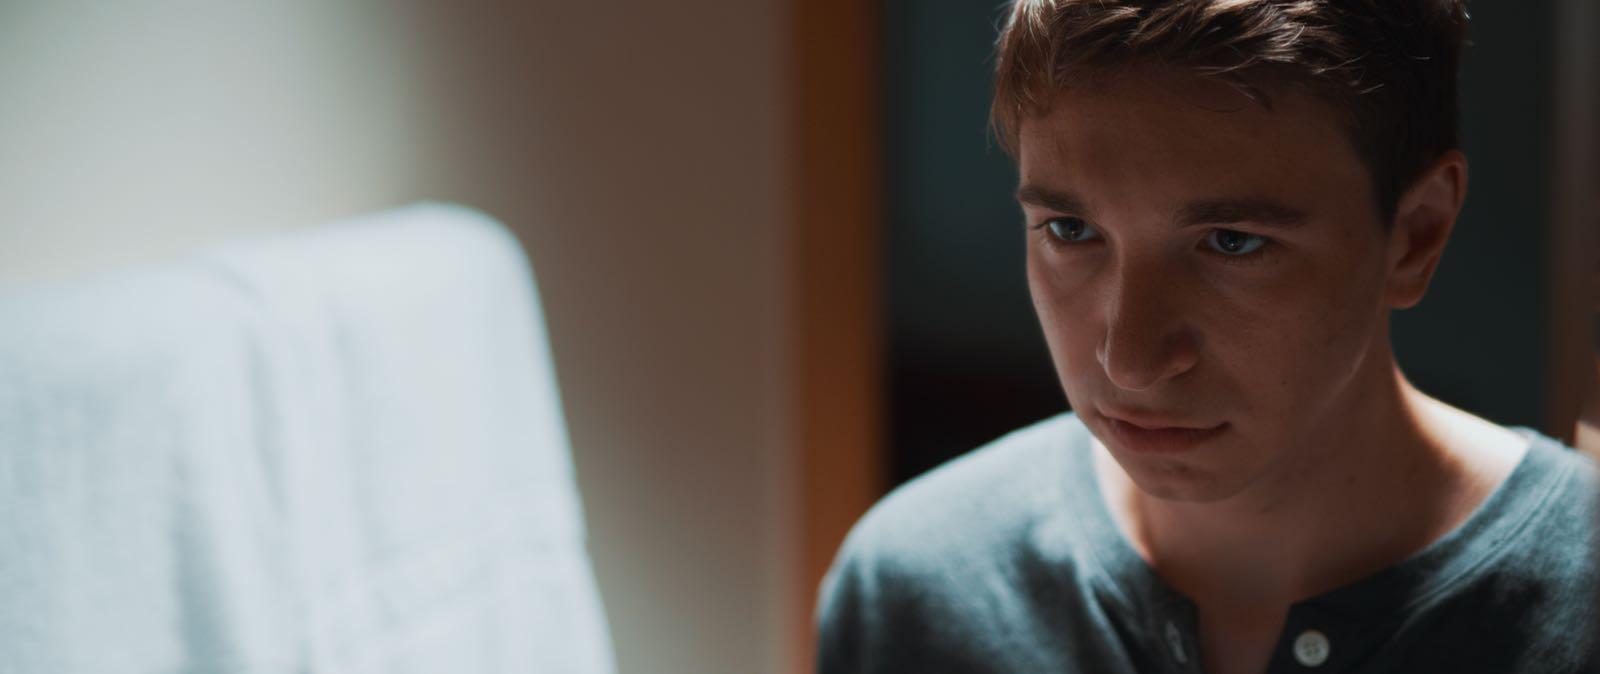 Anomalie   Series   Director: Christian Stadach     DOP: Marco Eisenbarth     Gaffer: Julian Zalac